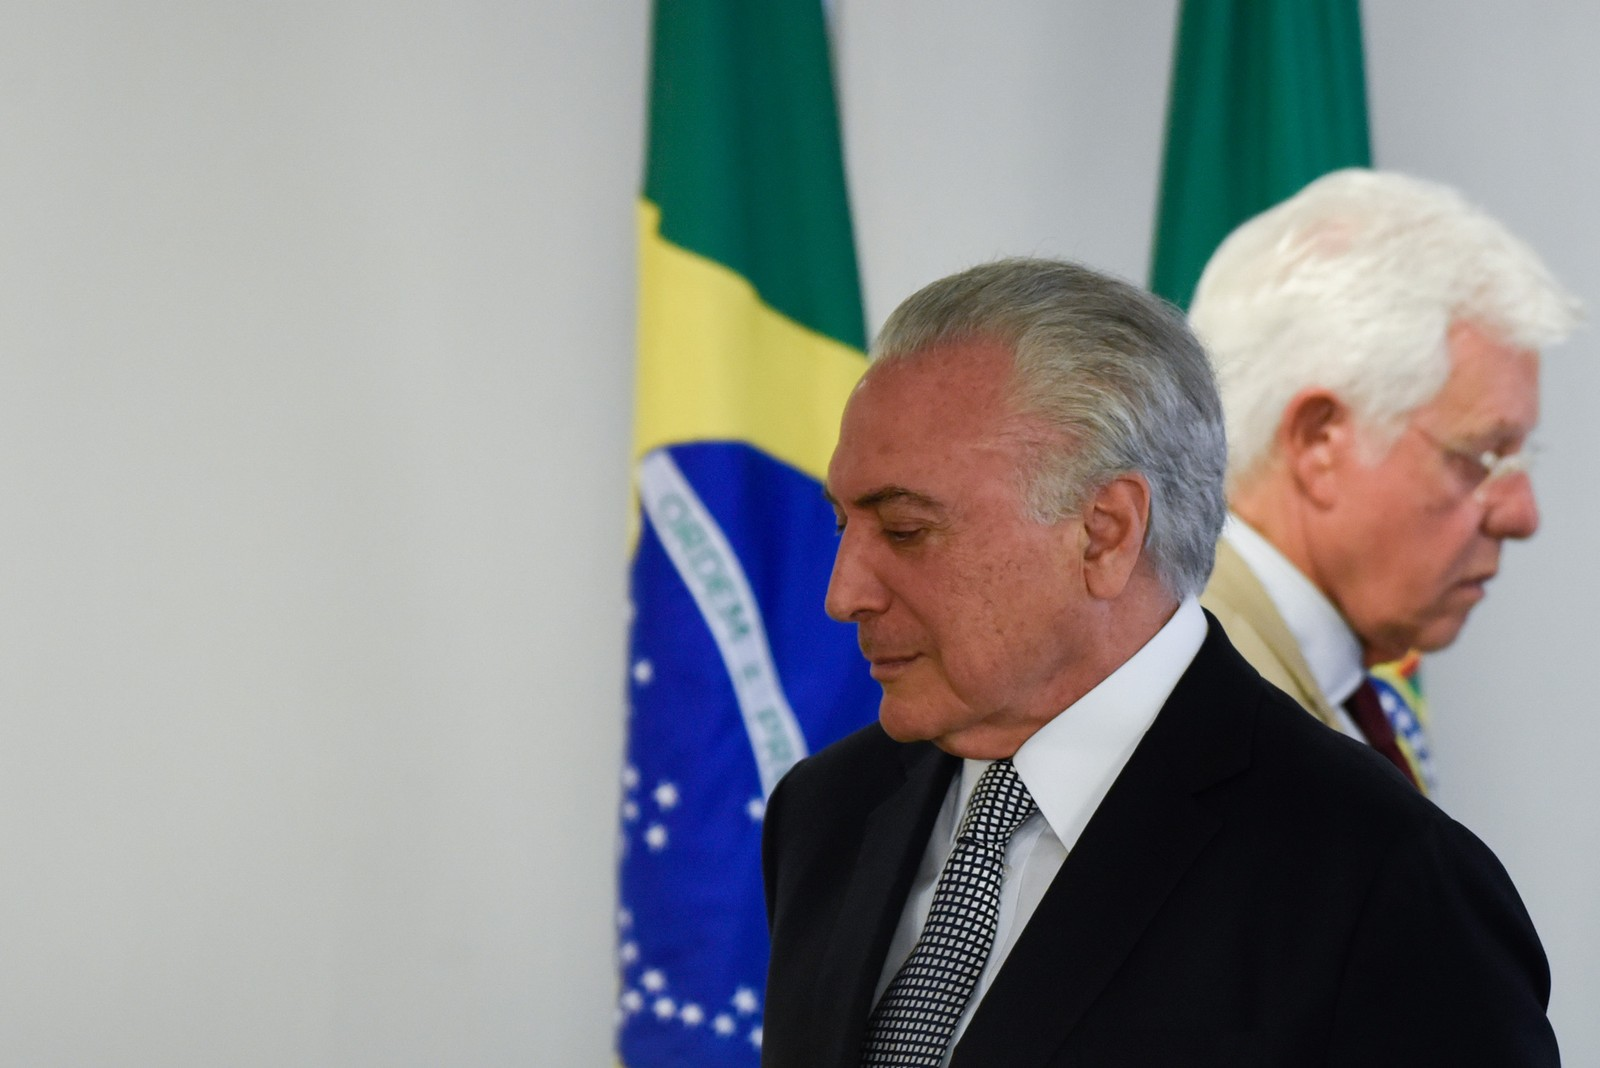 Temer é o segundo ex-presidente do Brasil preso por crime comum; Lula foi o primeiro